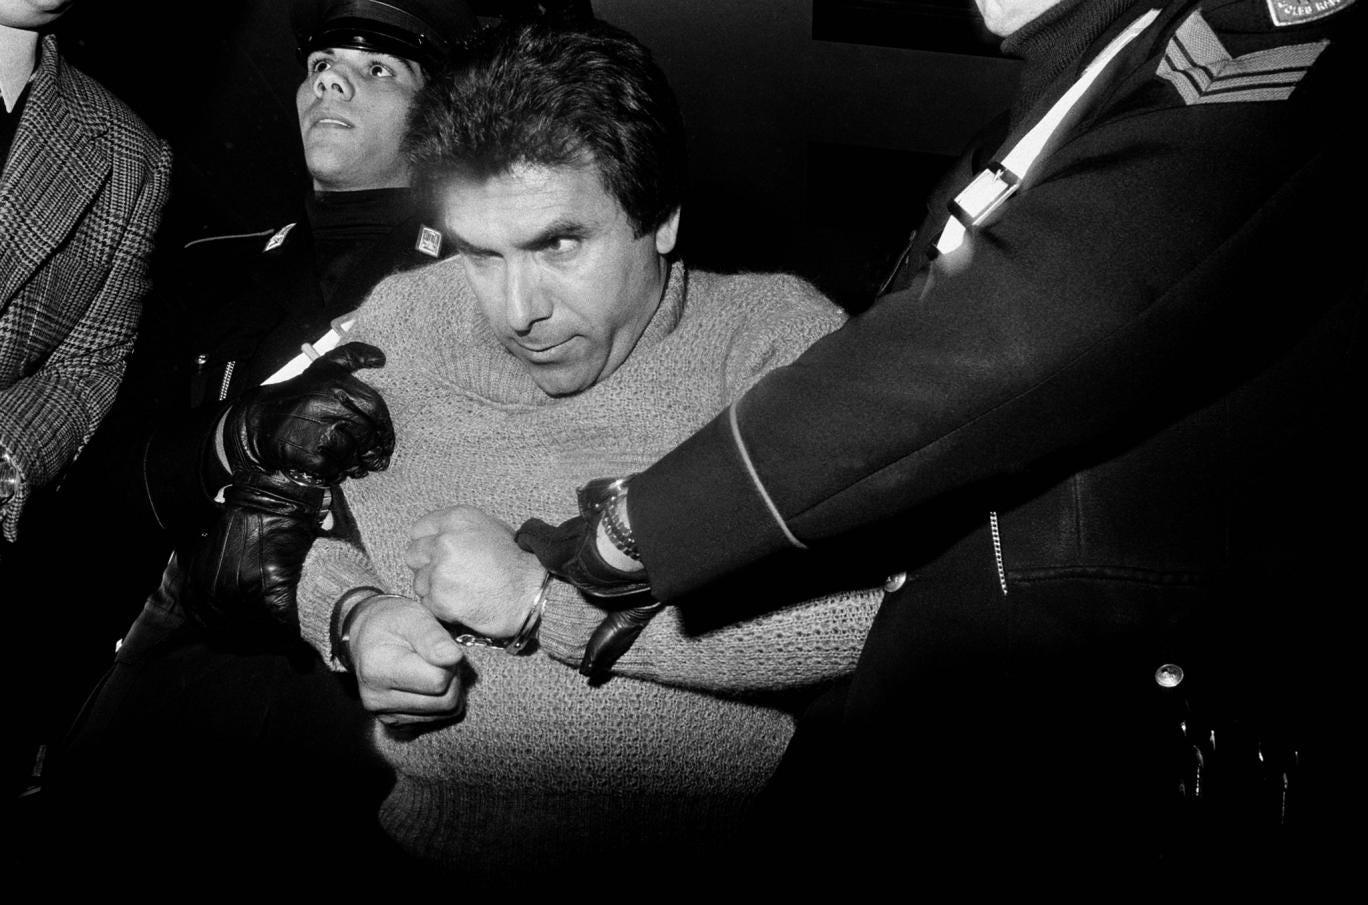 Palermo, 1980: The capture of Mafia godfather Leoluca Bagarella